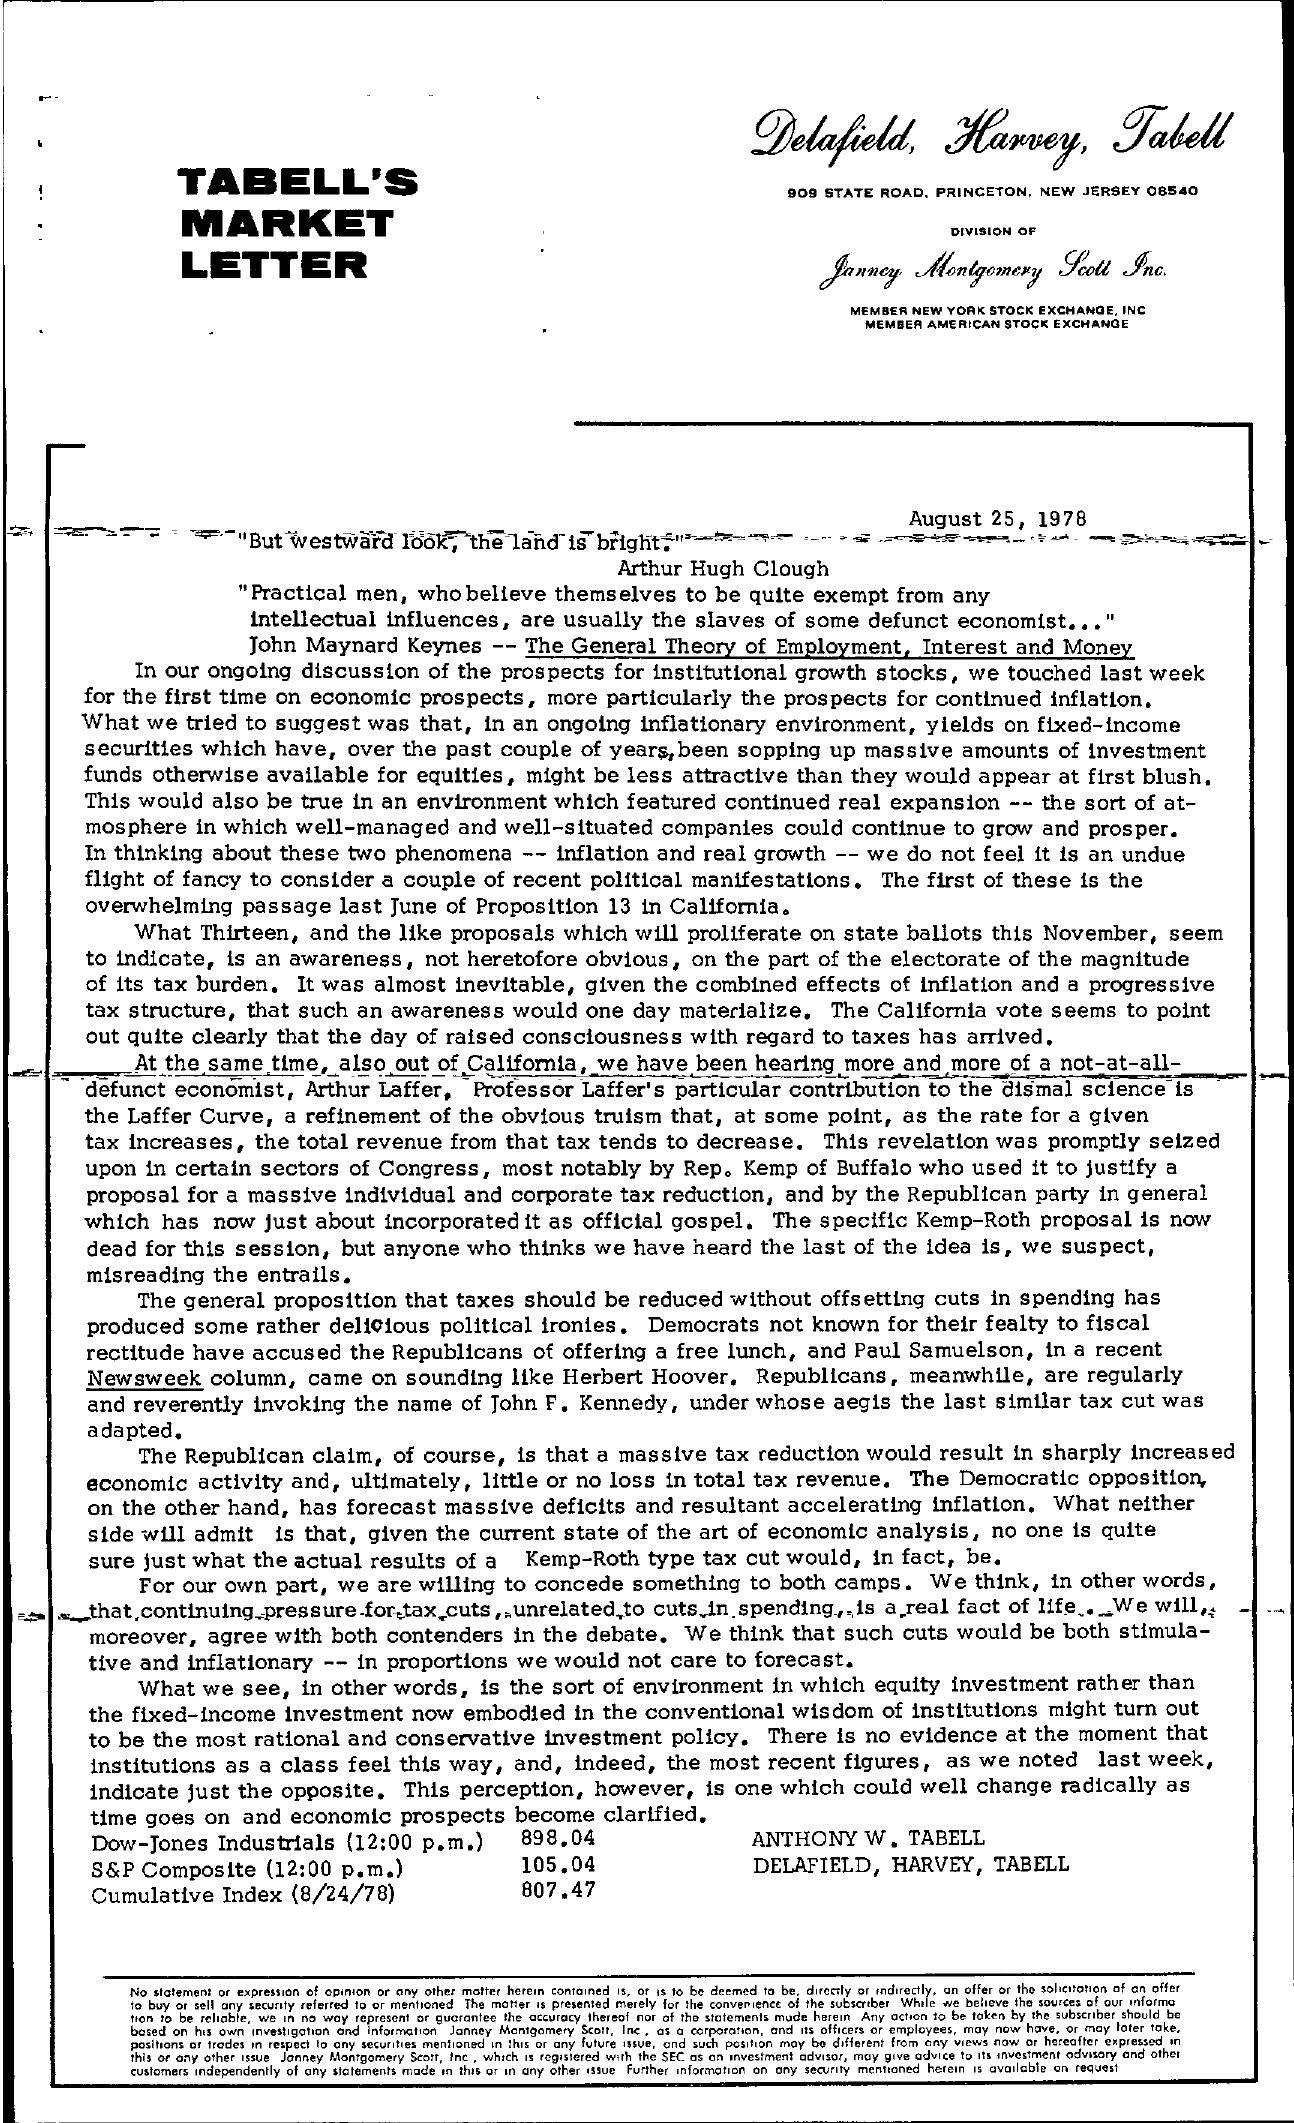 Tabell's Market Letter - August 25, 1978